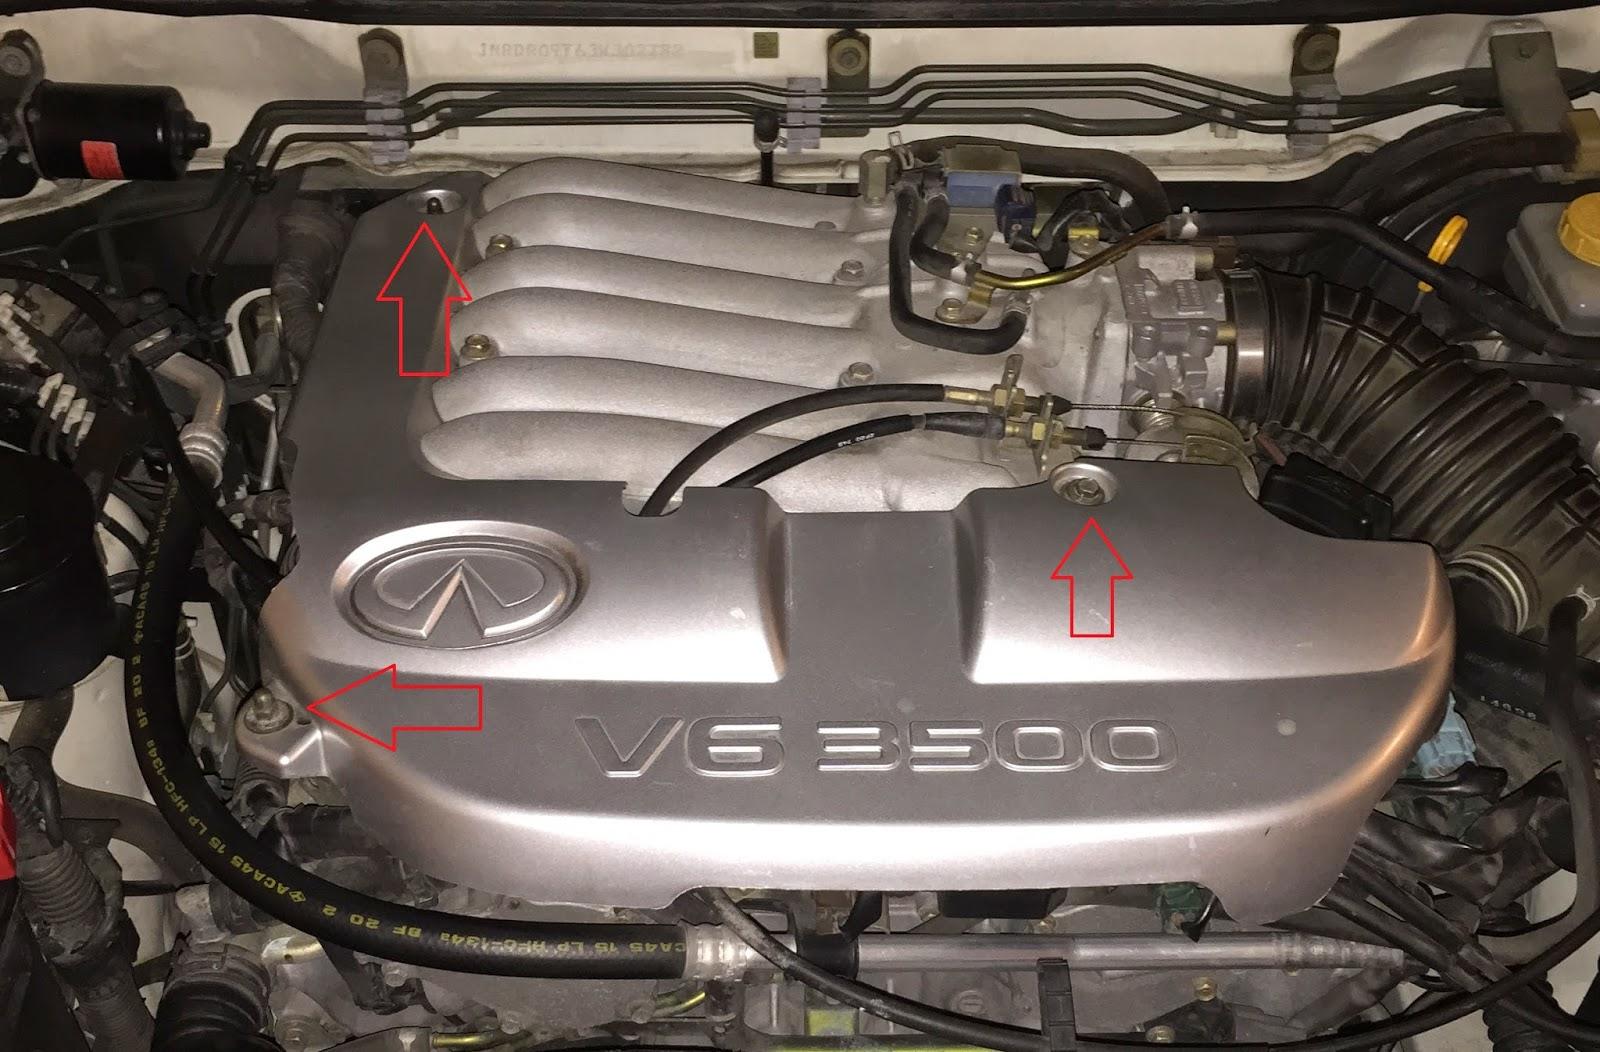 2003 Nissan Pathfinder Engine Diagram Cell Membrane 97 Infiniti Qx4 Parts